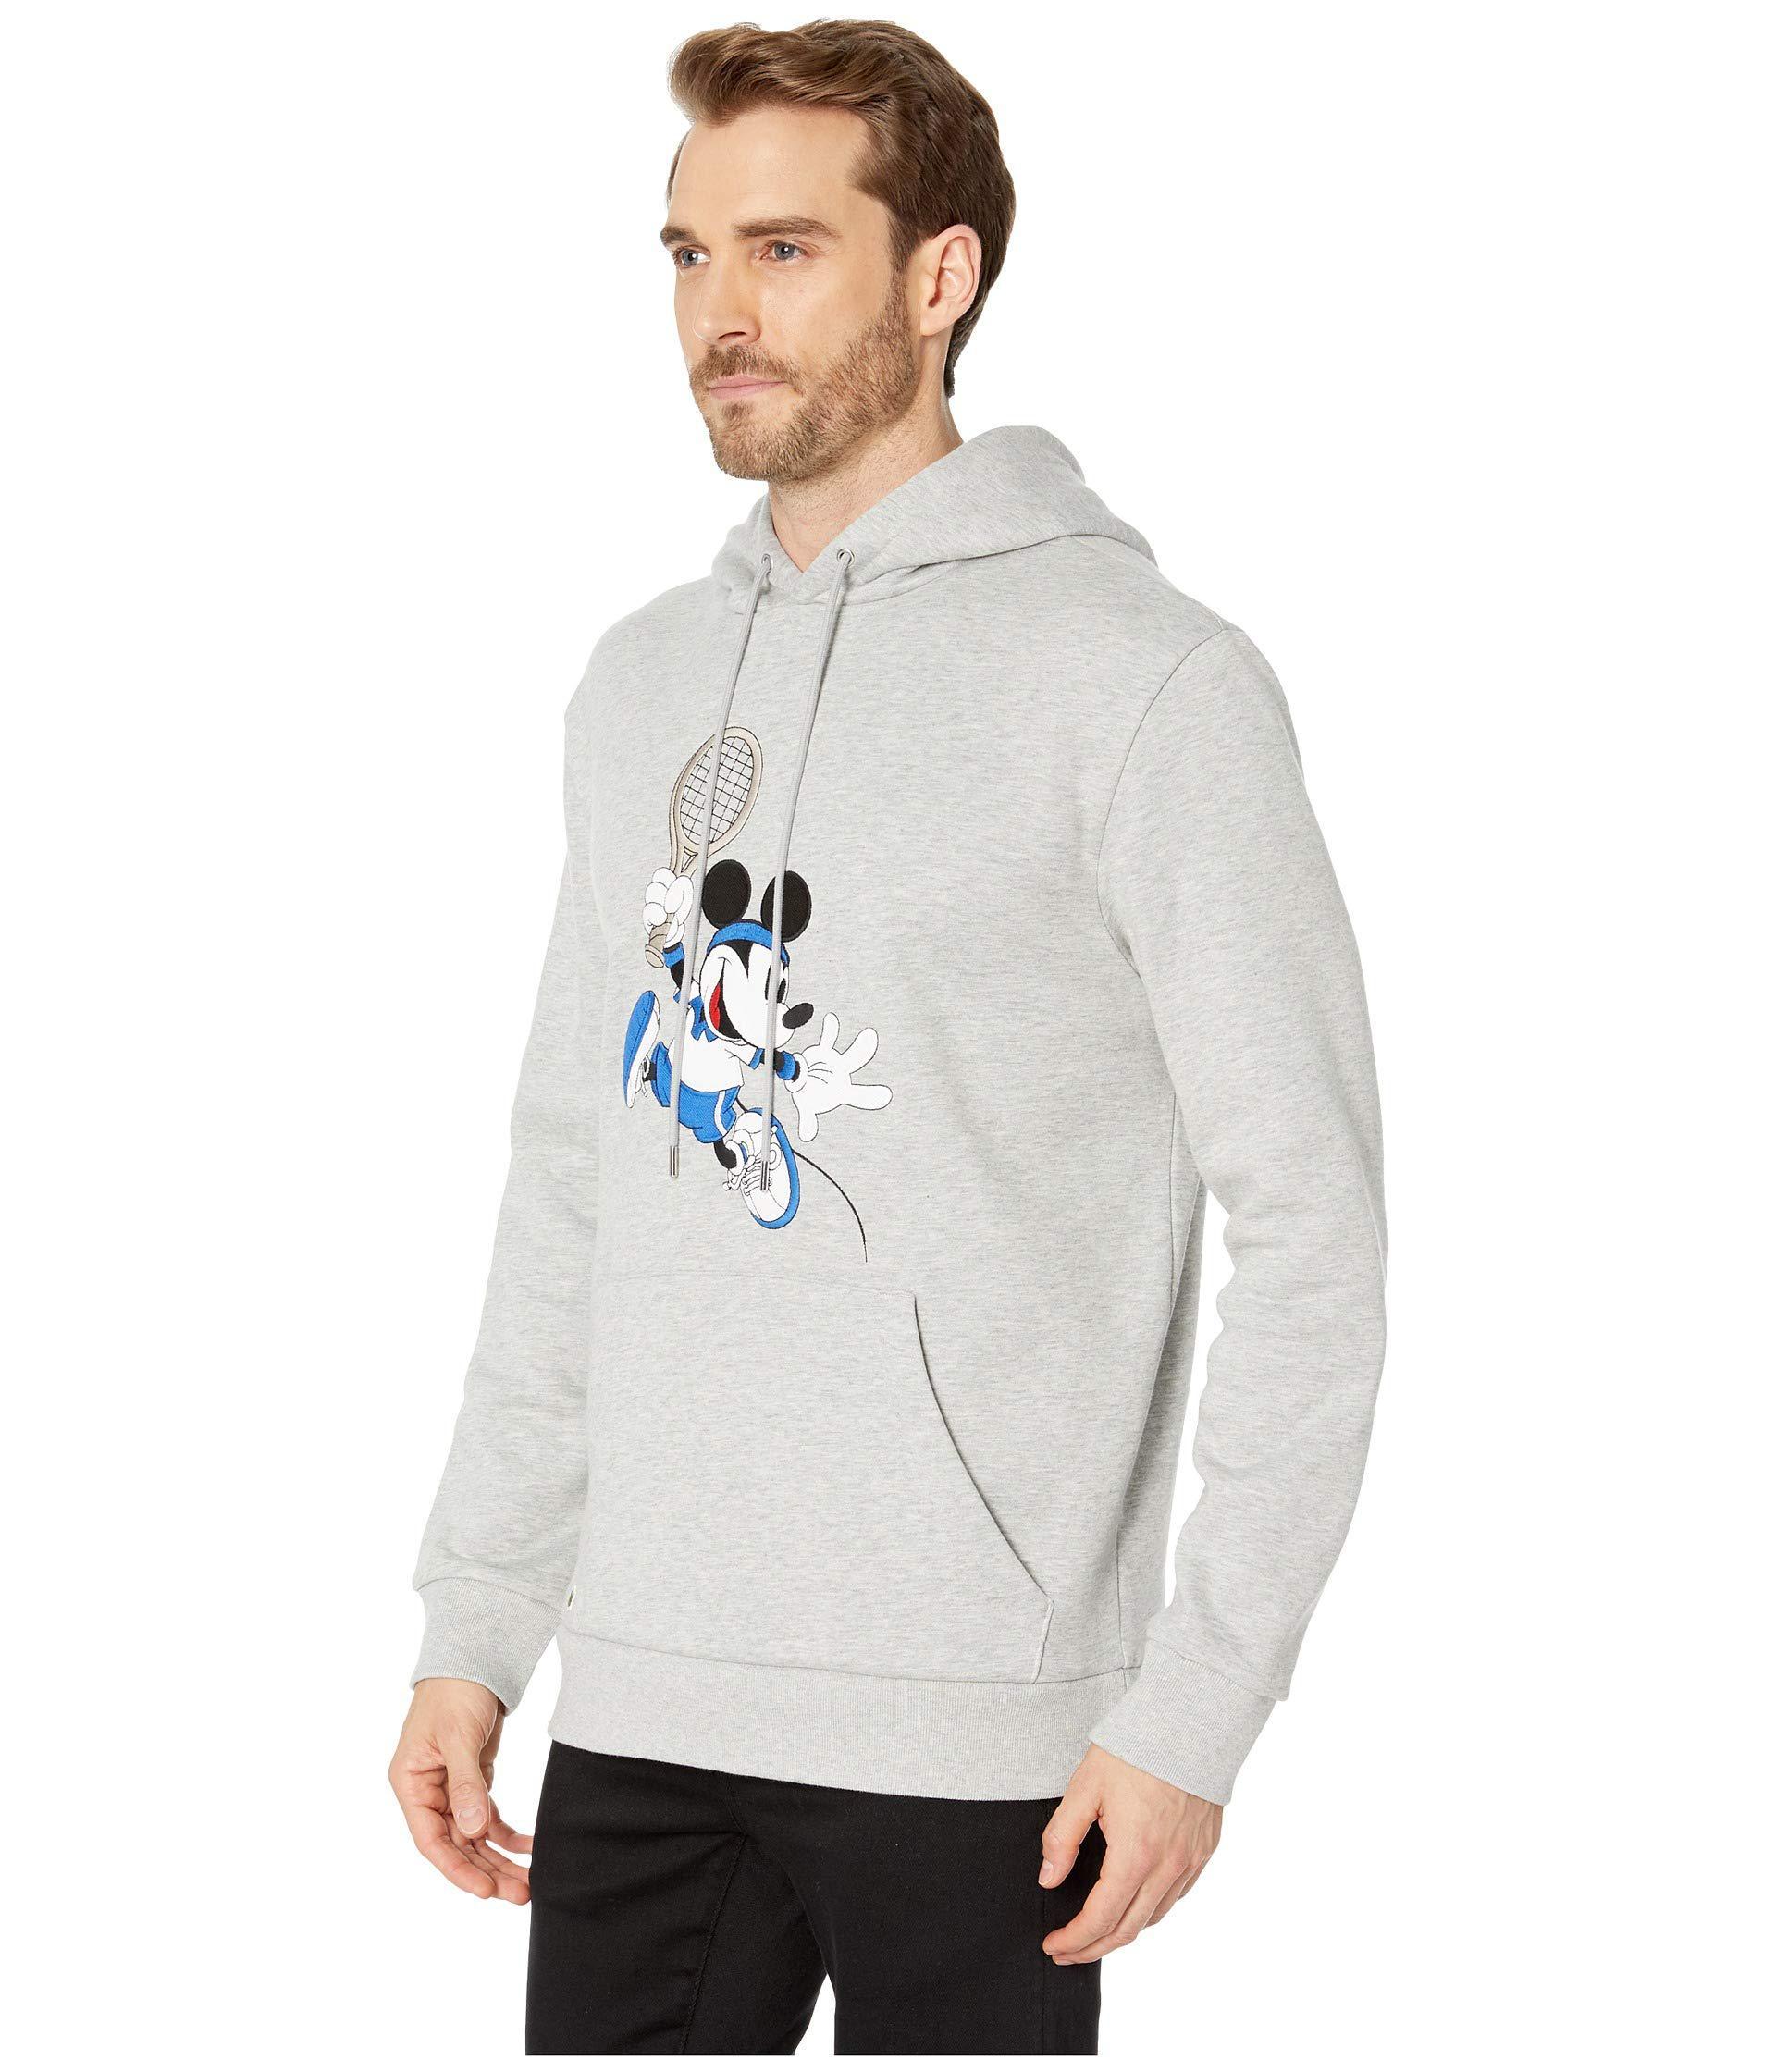 2822361a14 Chine silver Hooded Disney Lacoste Lyst r Sweatshirt Men's wxXSn